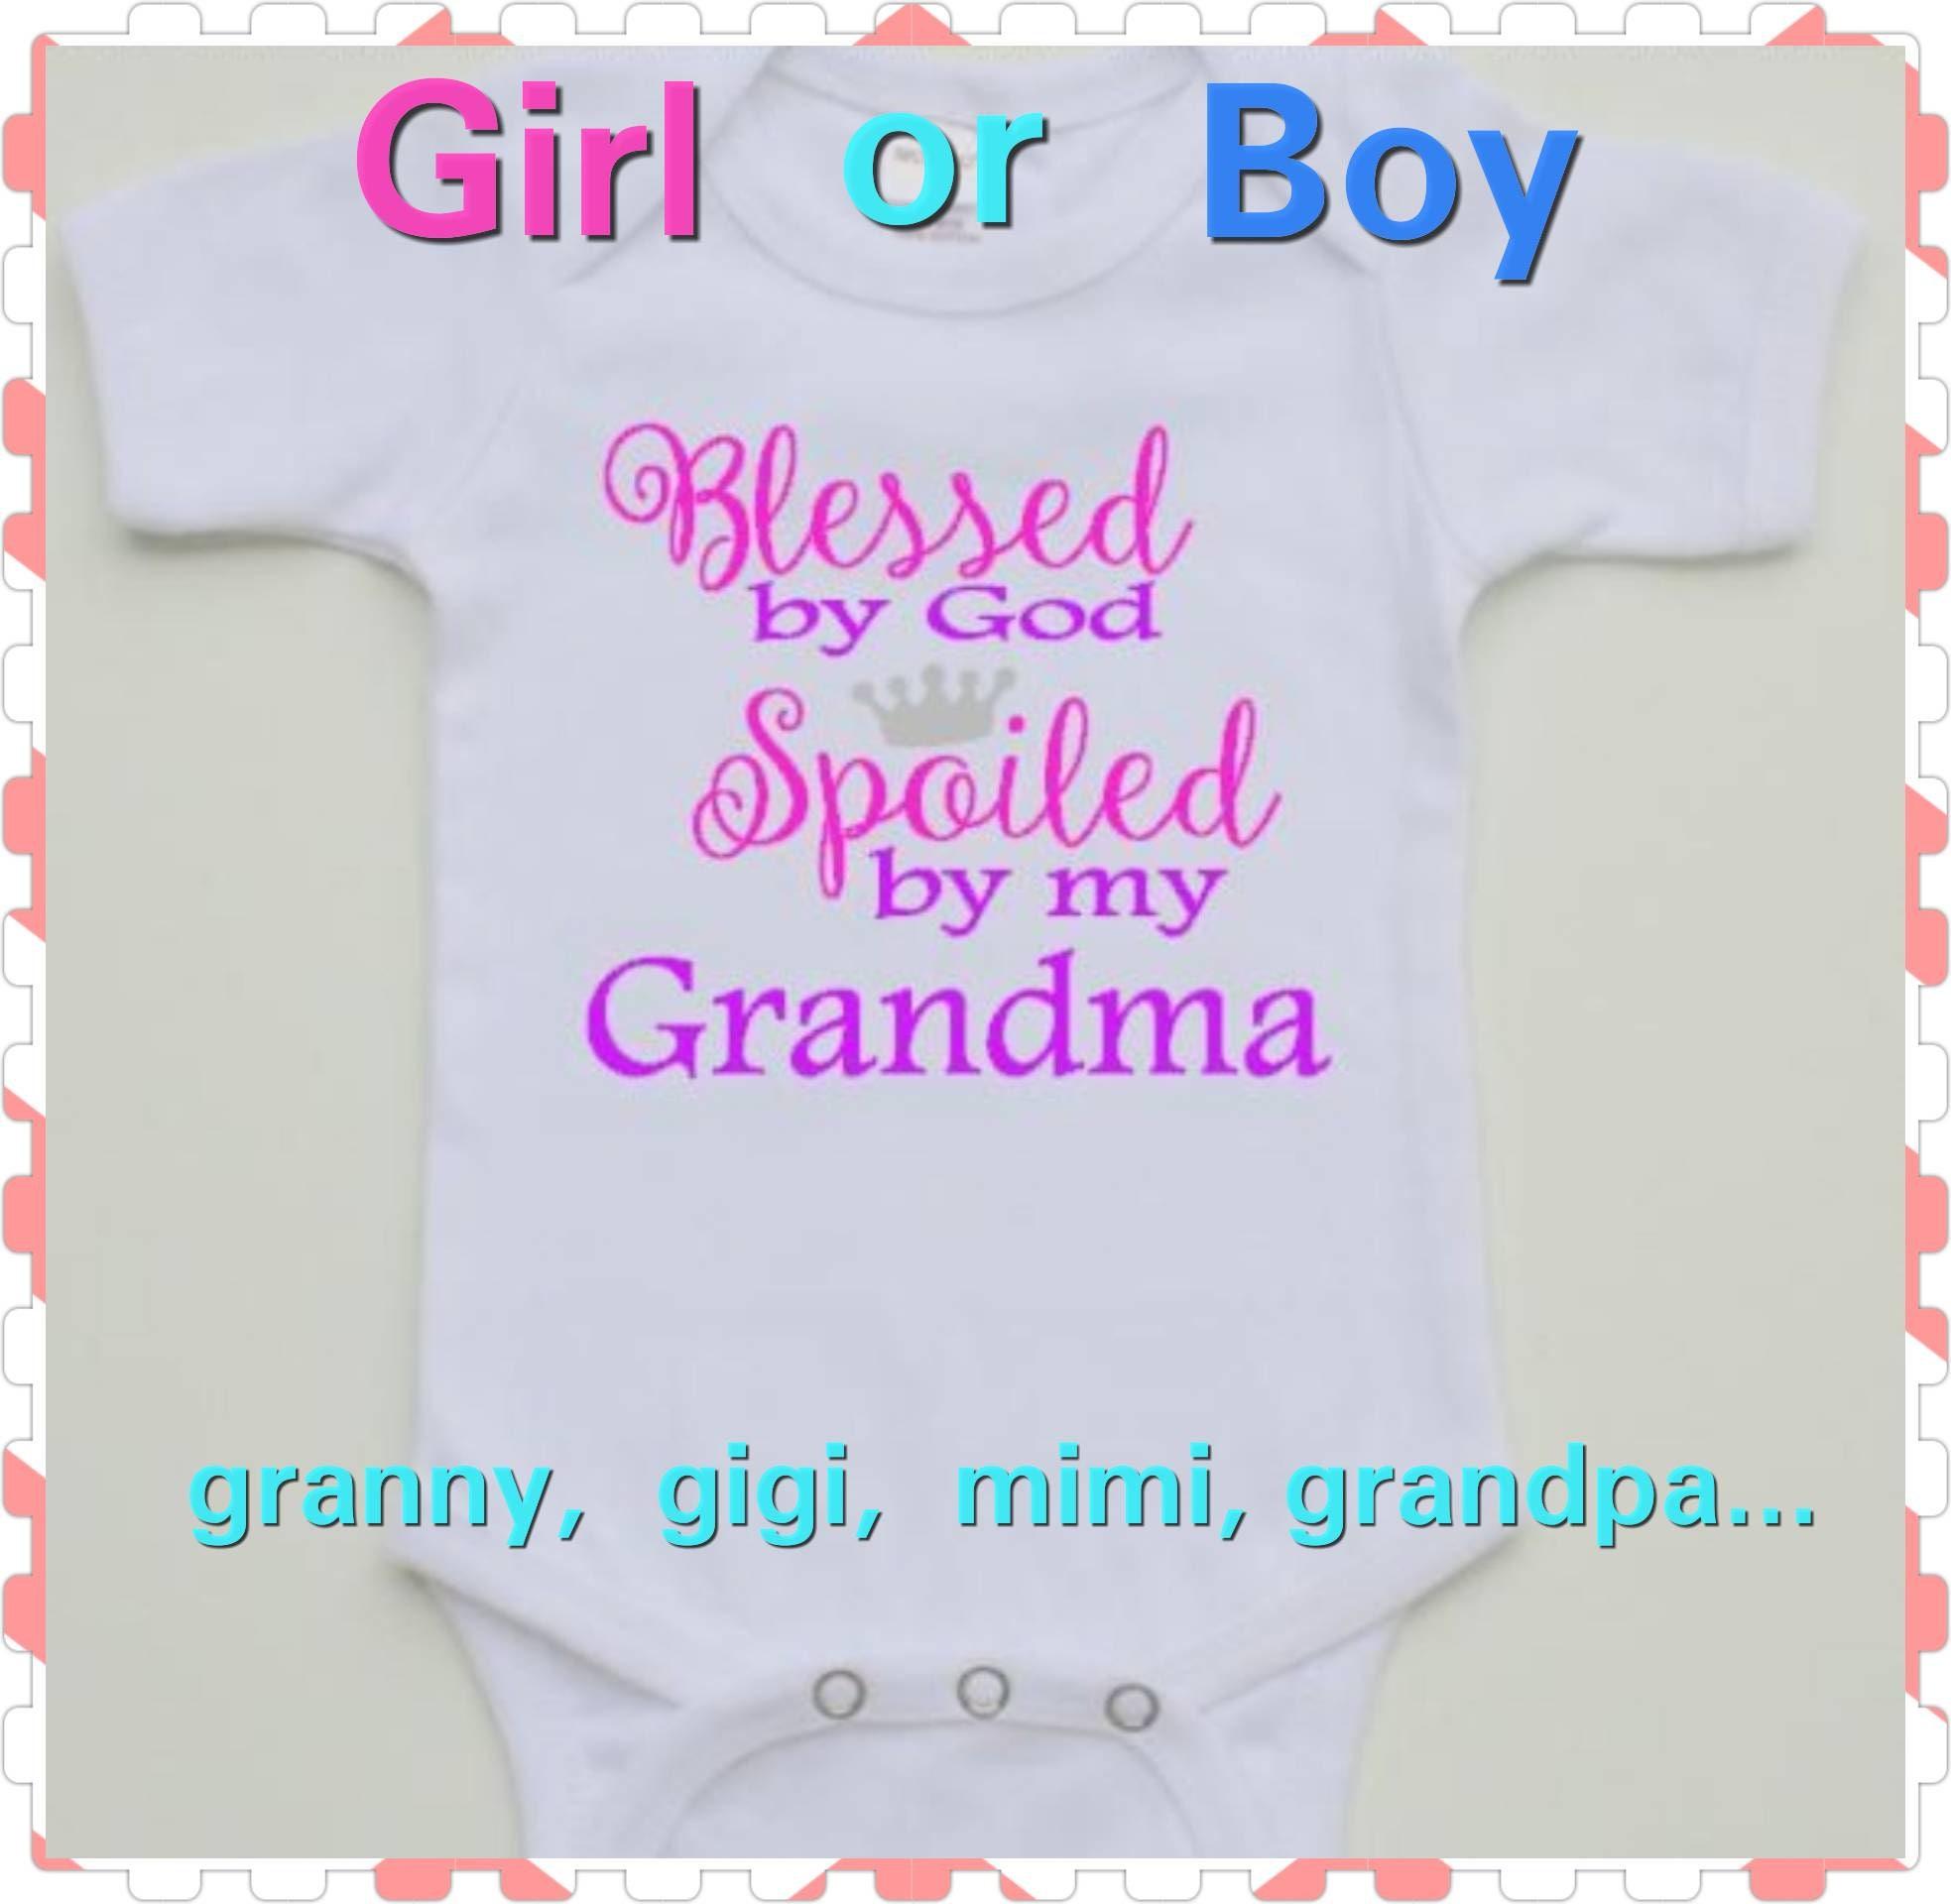 99145b40b Blessed By God, Spoiled By Grandma, Baby Girl or Baby Boy Onesie, Preemie,  Twins, Newborn, Funny, Cute, Onesie, Choice Of Colors